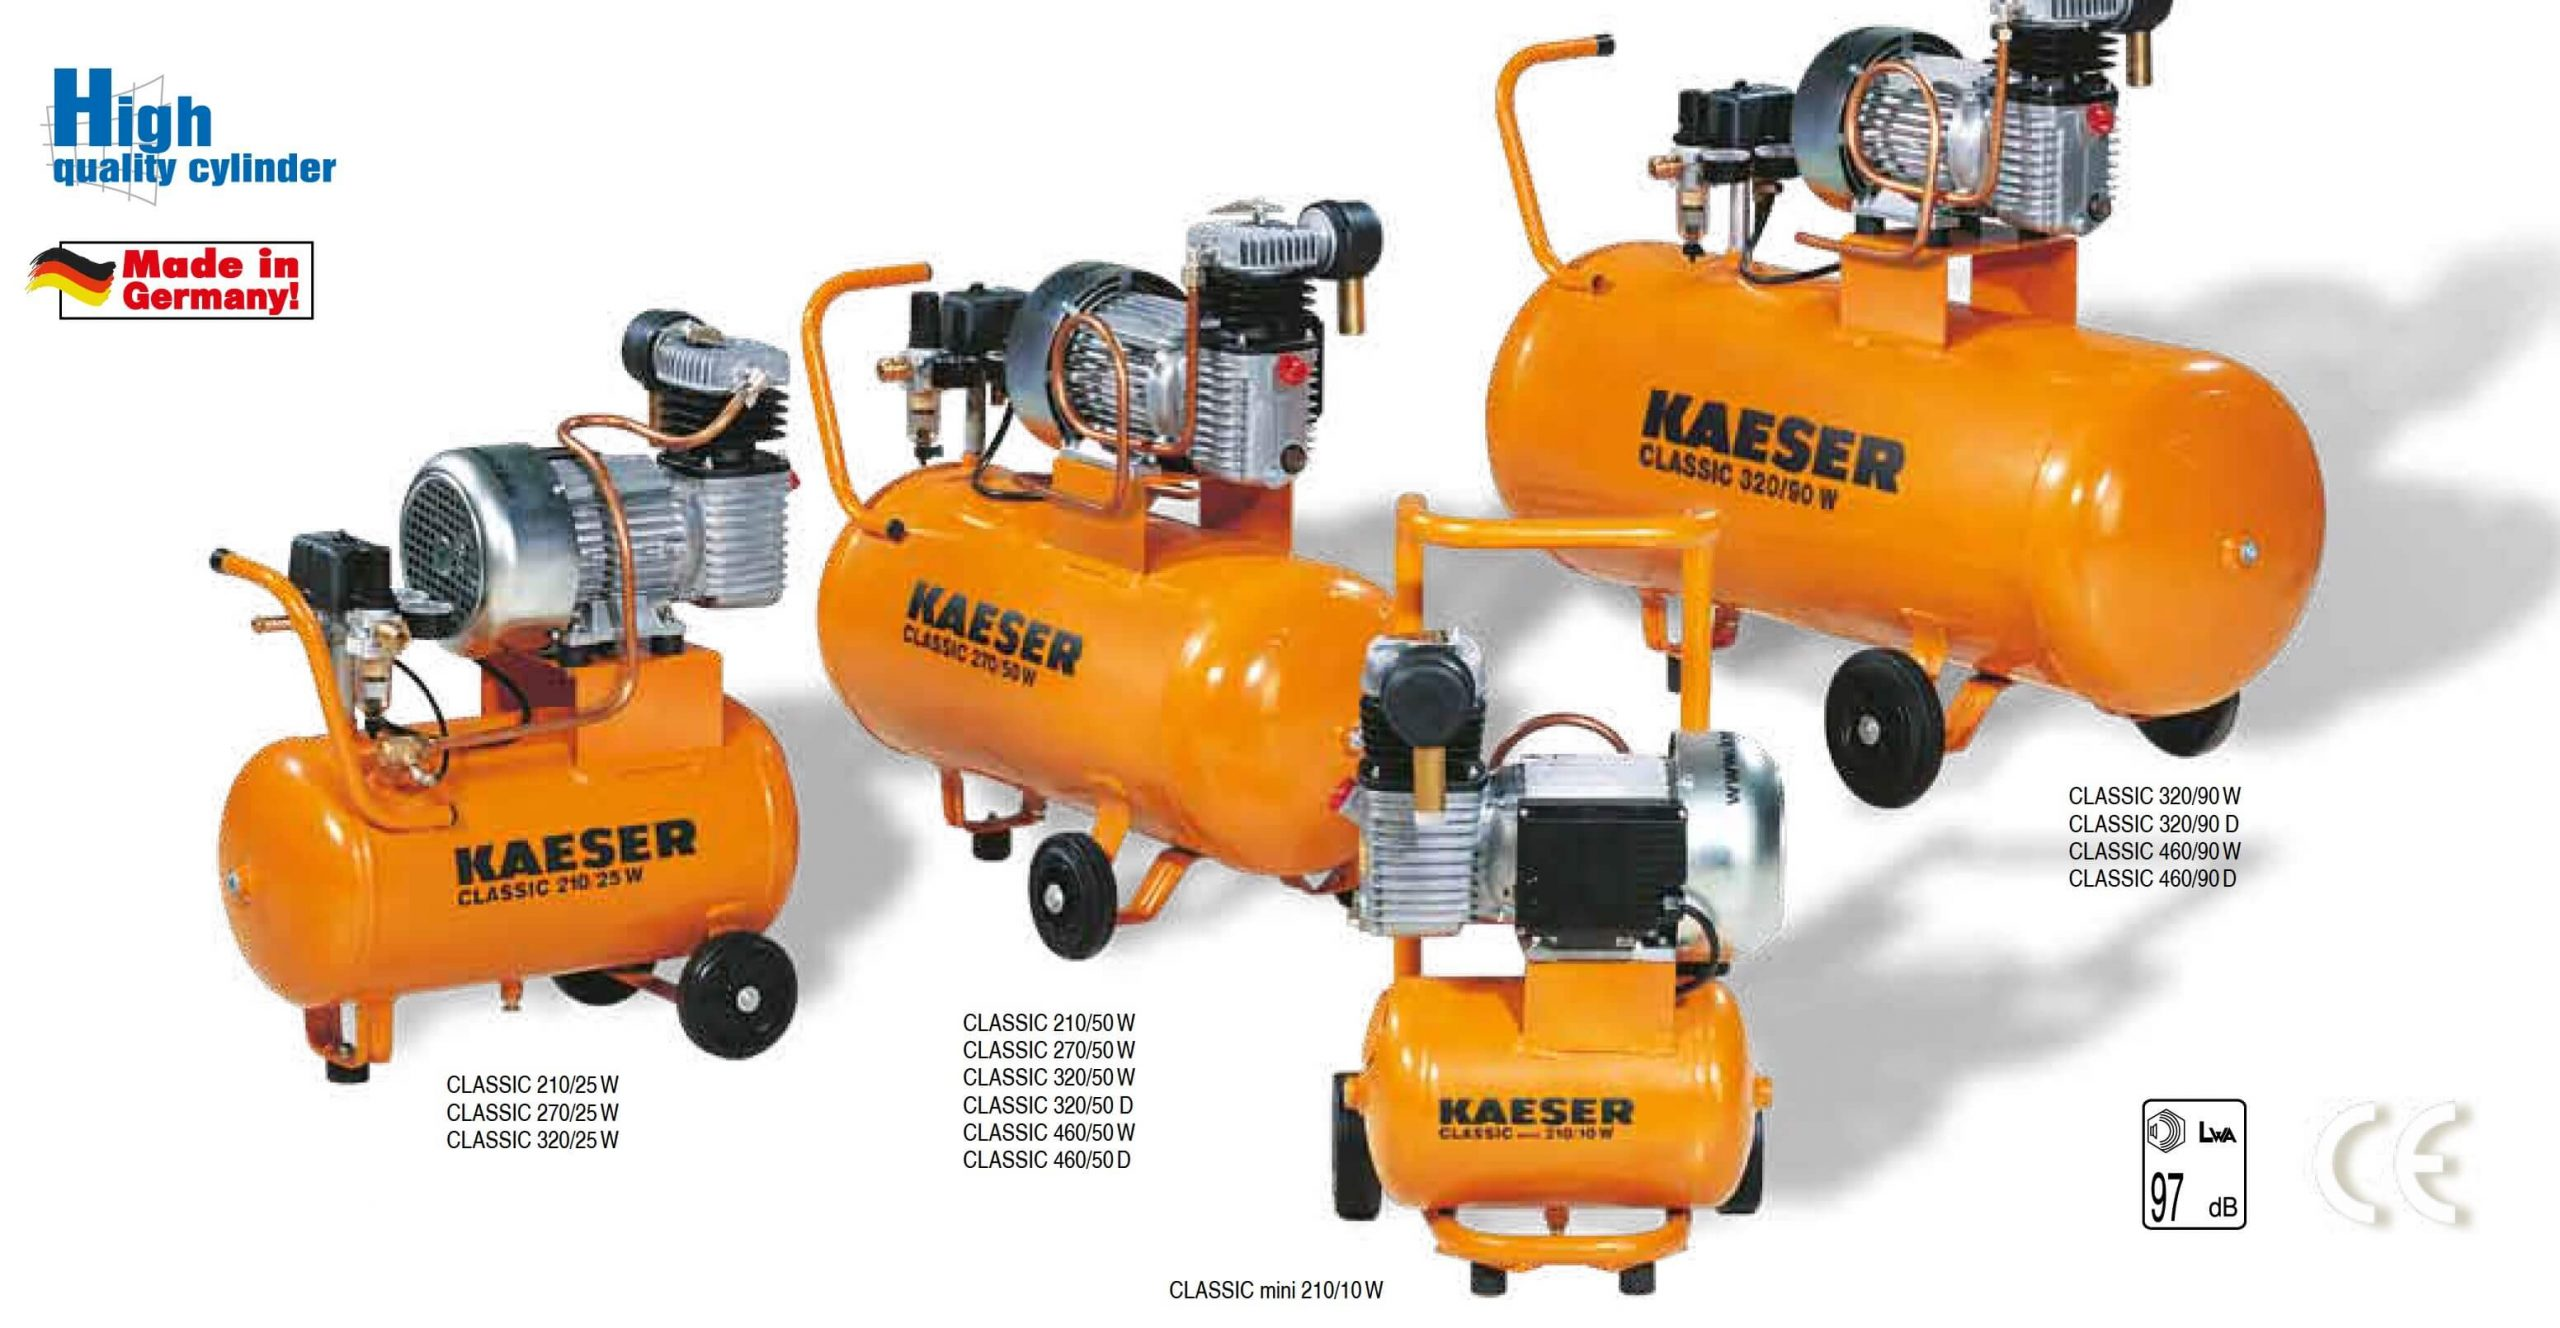 compresoare cu piston CLASSIC mini 210-10 W ÷ CLASSIC 460-90 D